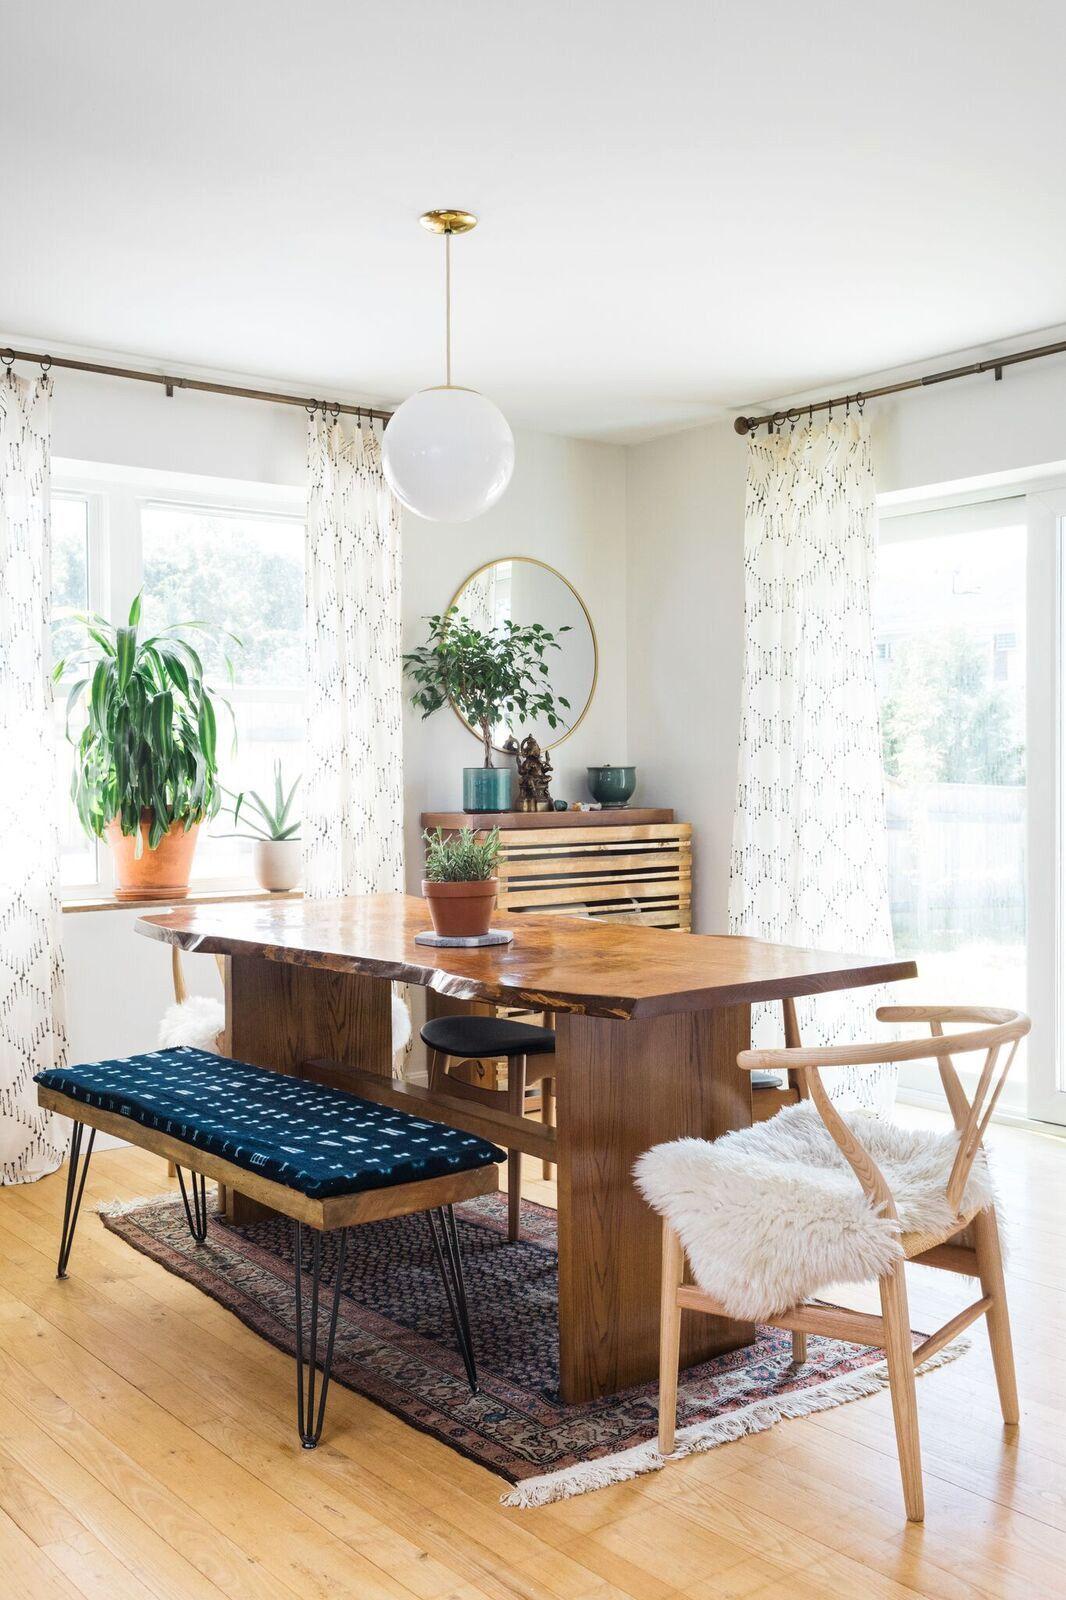 Modern bohemian home decor  A Suburban Home Gets A ContemporaryBohemian Makeover  Decorated